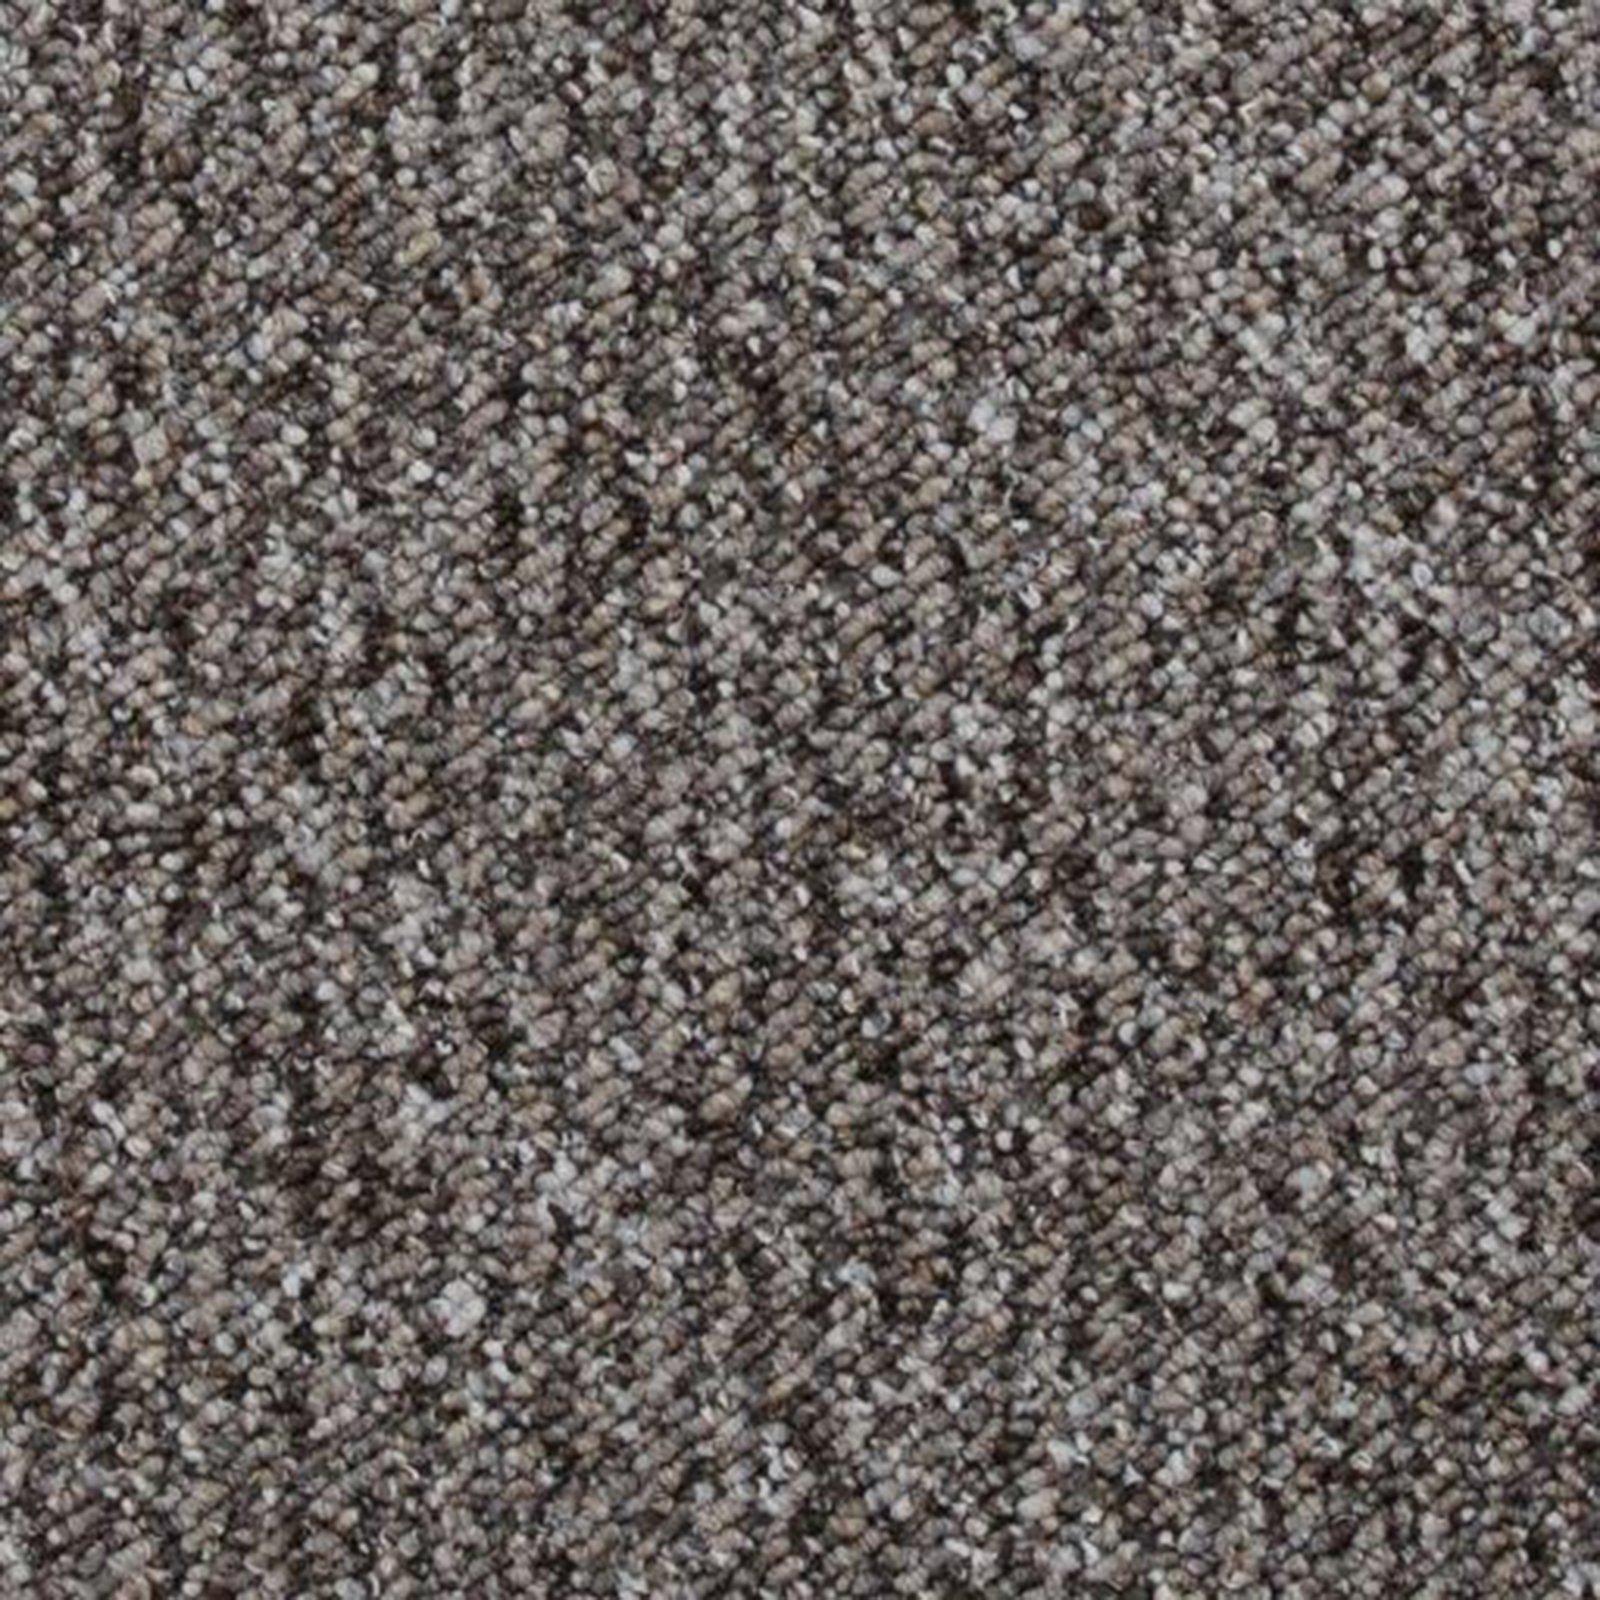 teppichboden montana braun 4 meter breit teppichboden bodenbel ge renovieren roller. Black Bedroom Furniture Sets. Home Design Ideas